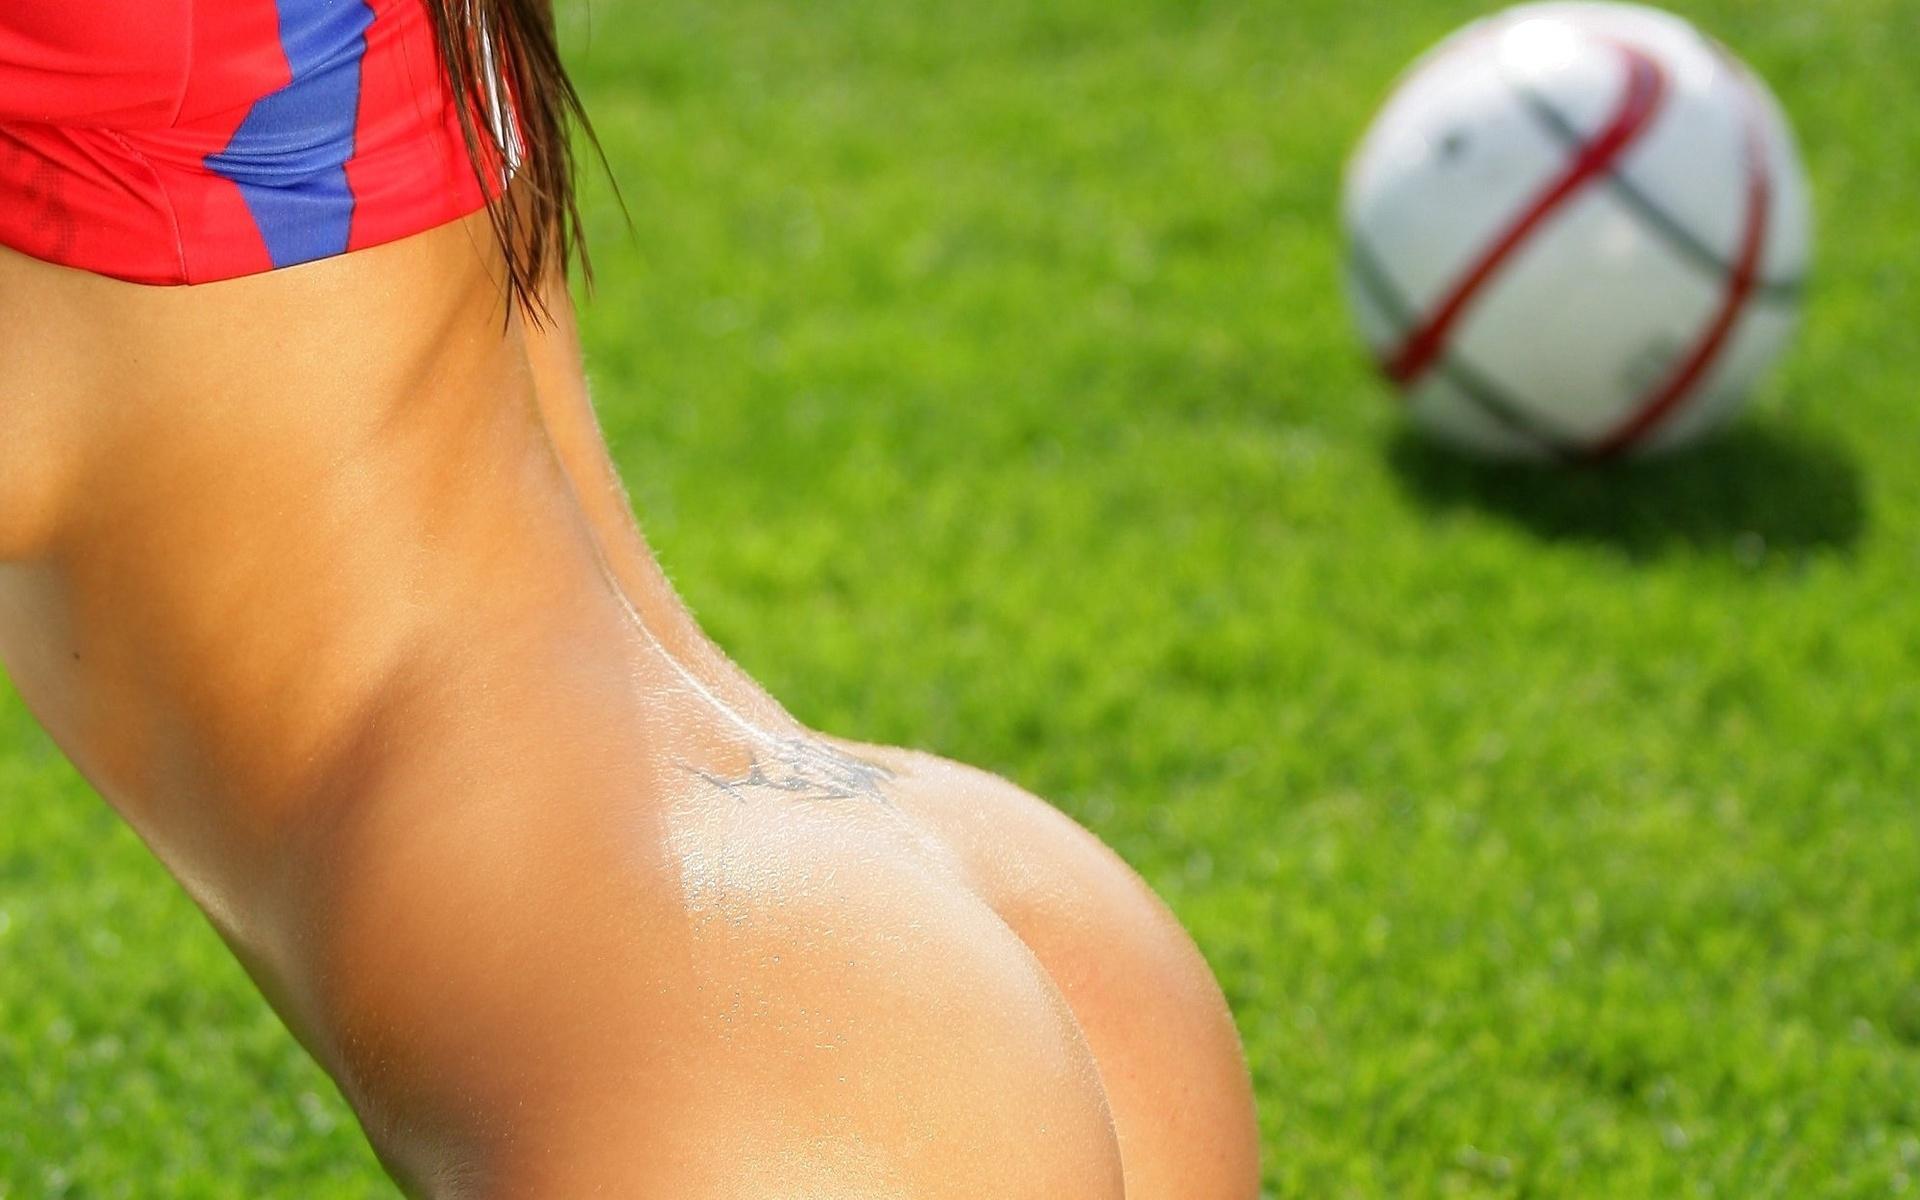 Футбол девушки эротика 6 фотография